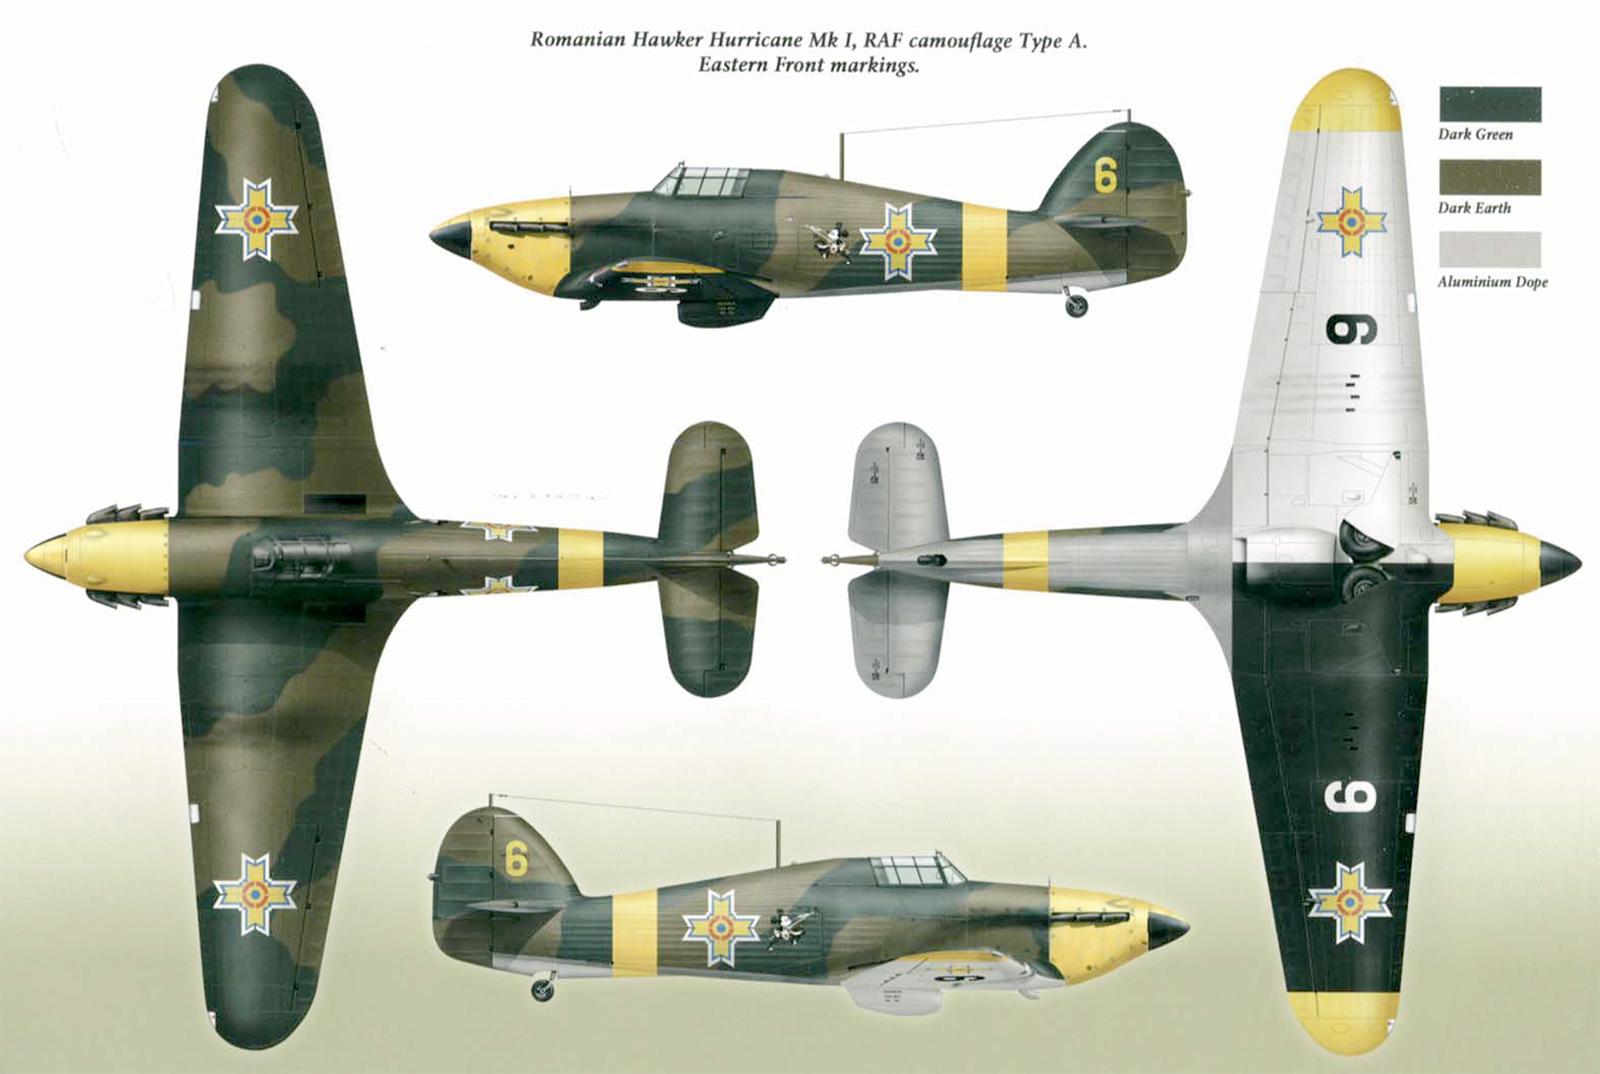 Hawker Hurricane Rumanian AF Esc 53 Yellow 3 Horia Agarici Rumania 1941 Mushroom 9111 0A